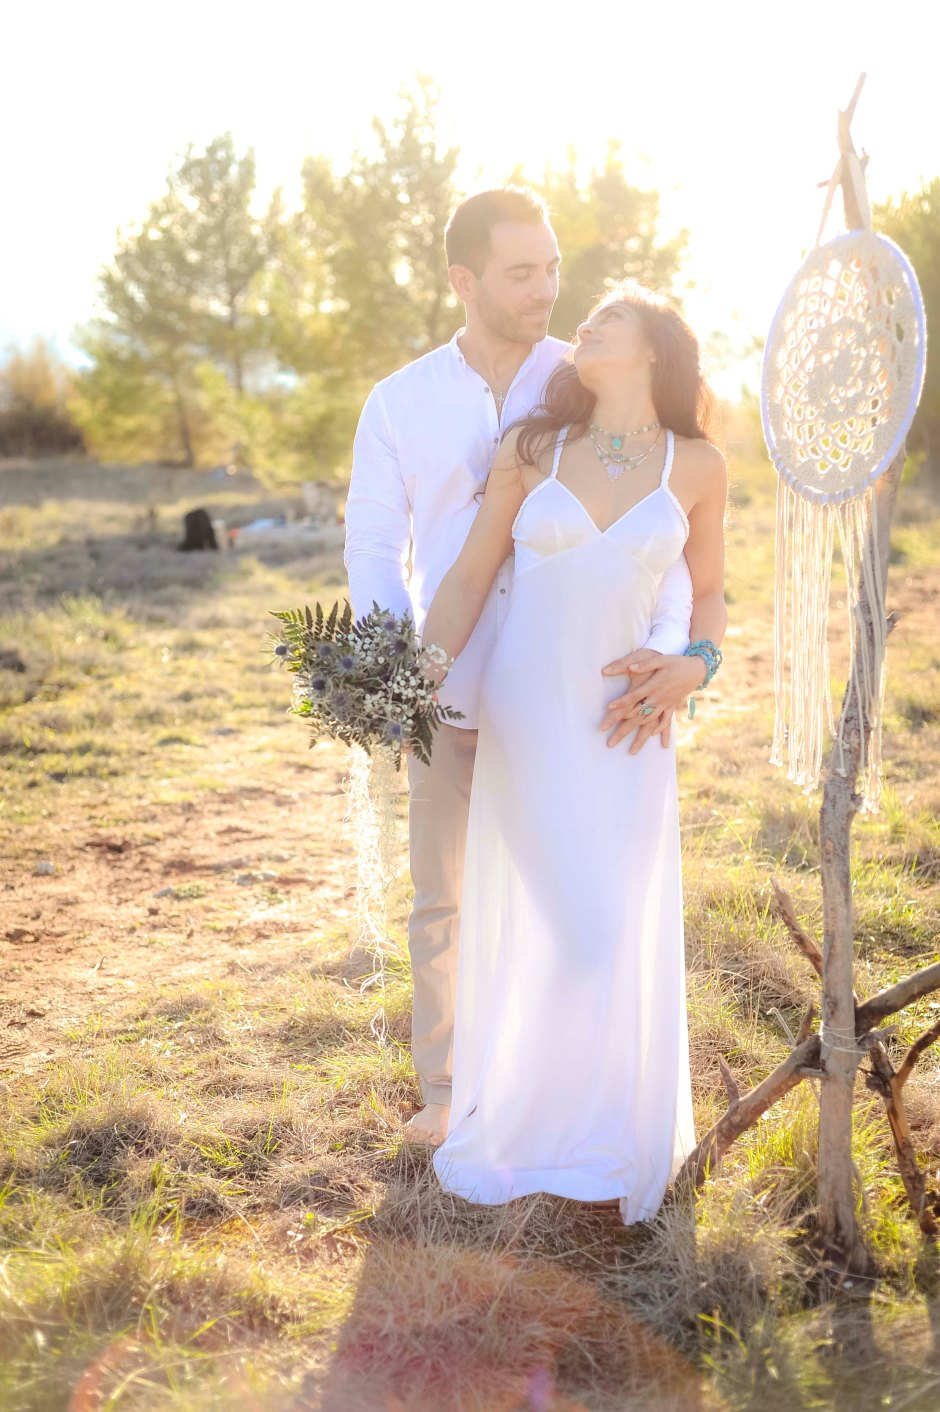 blog-mariage-navajo-beacon-ecole-jaelys-21